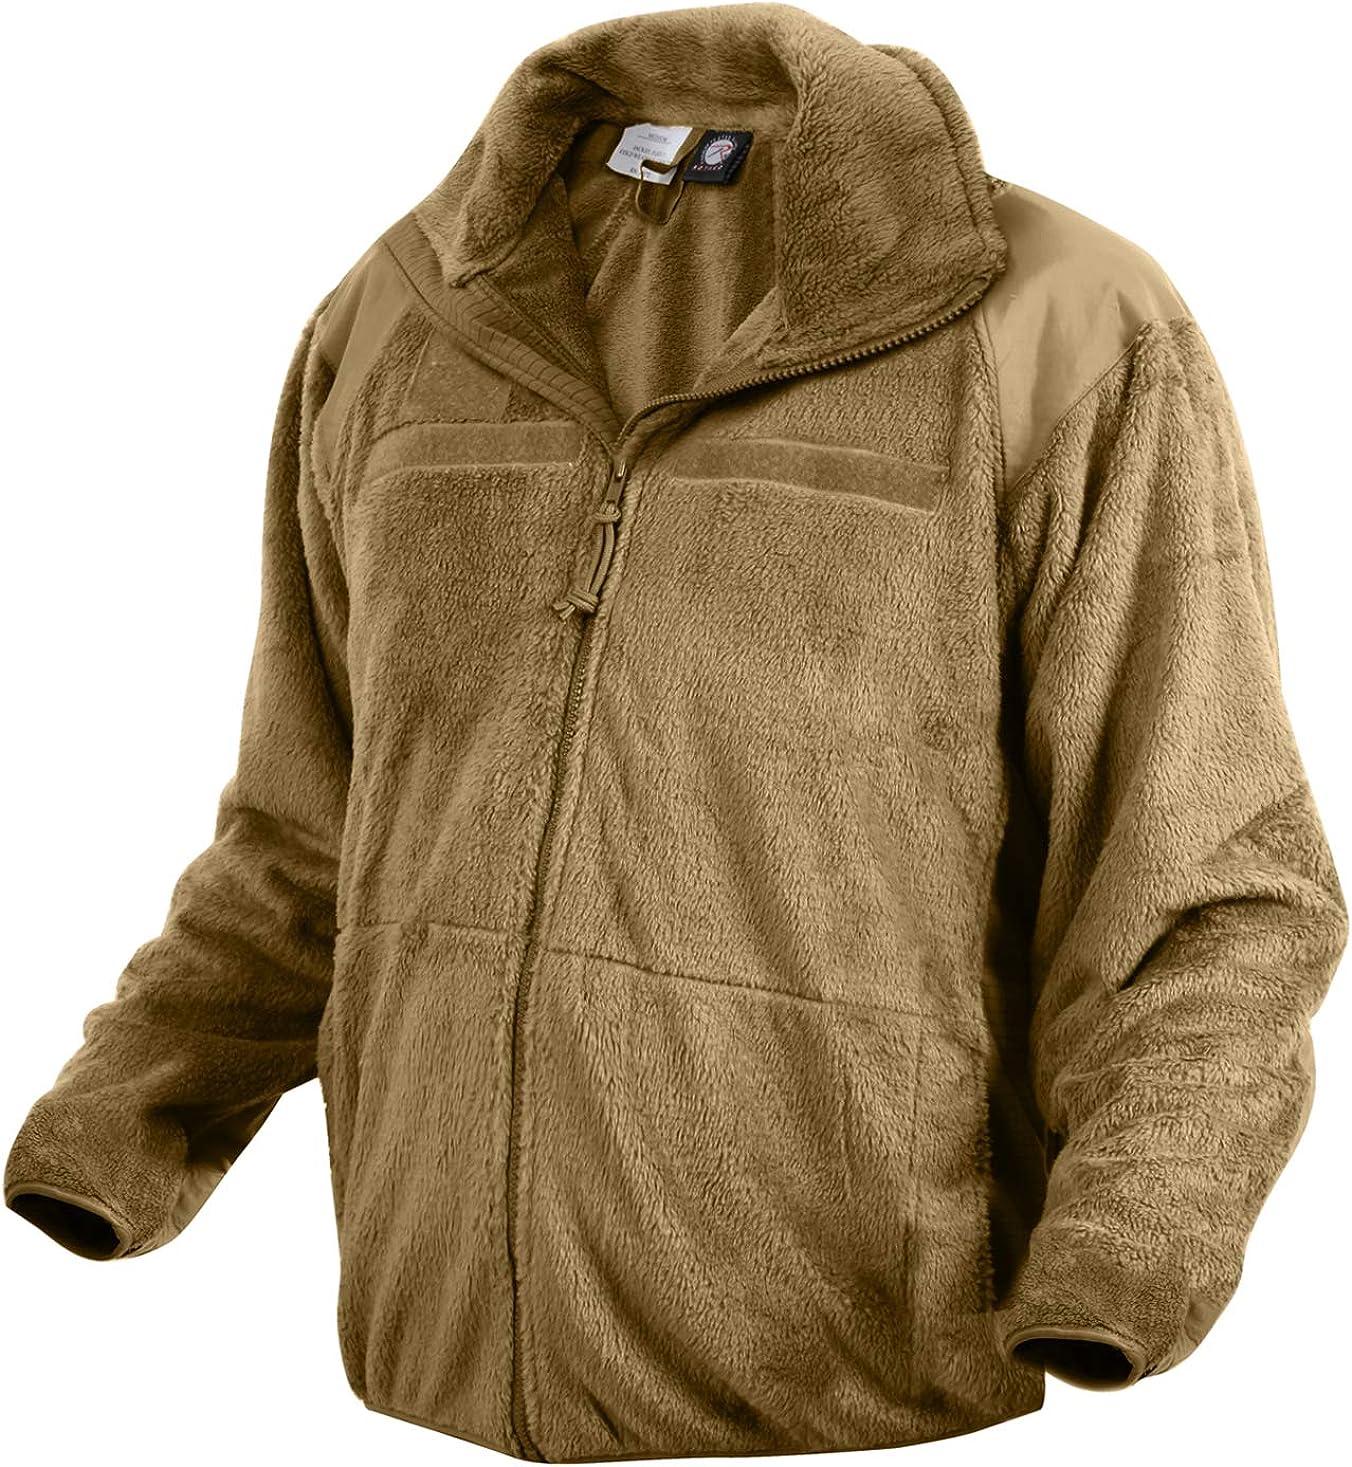 Rothco Generation III Level 3 ECWCS Fleece Jacket: Powersports Protective Jackets: Clothing